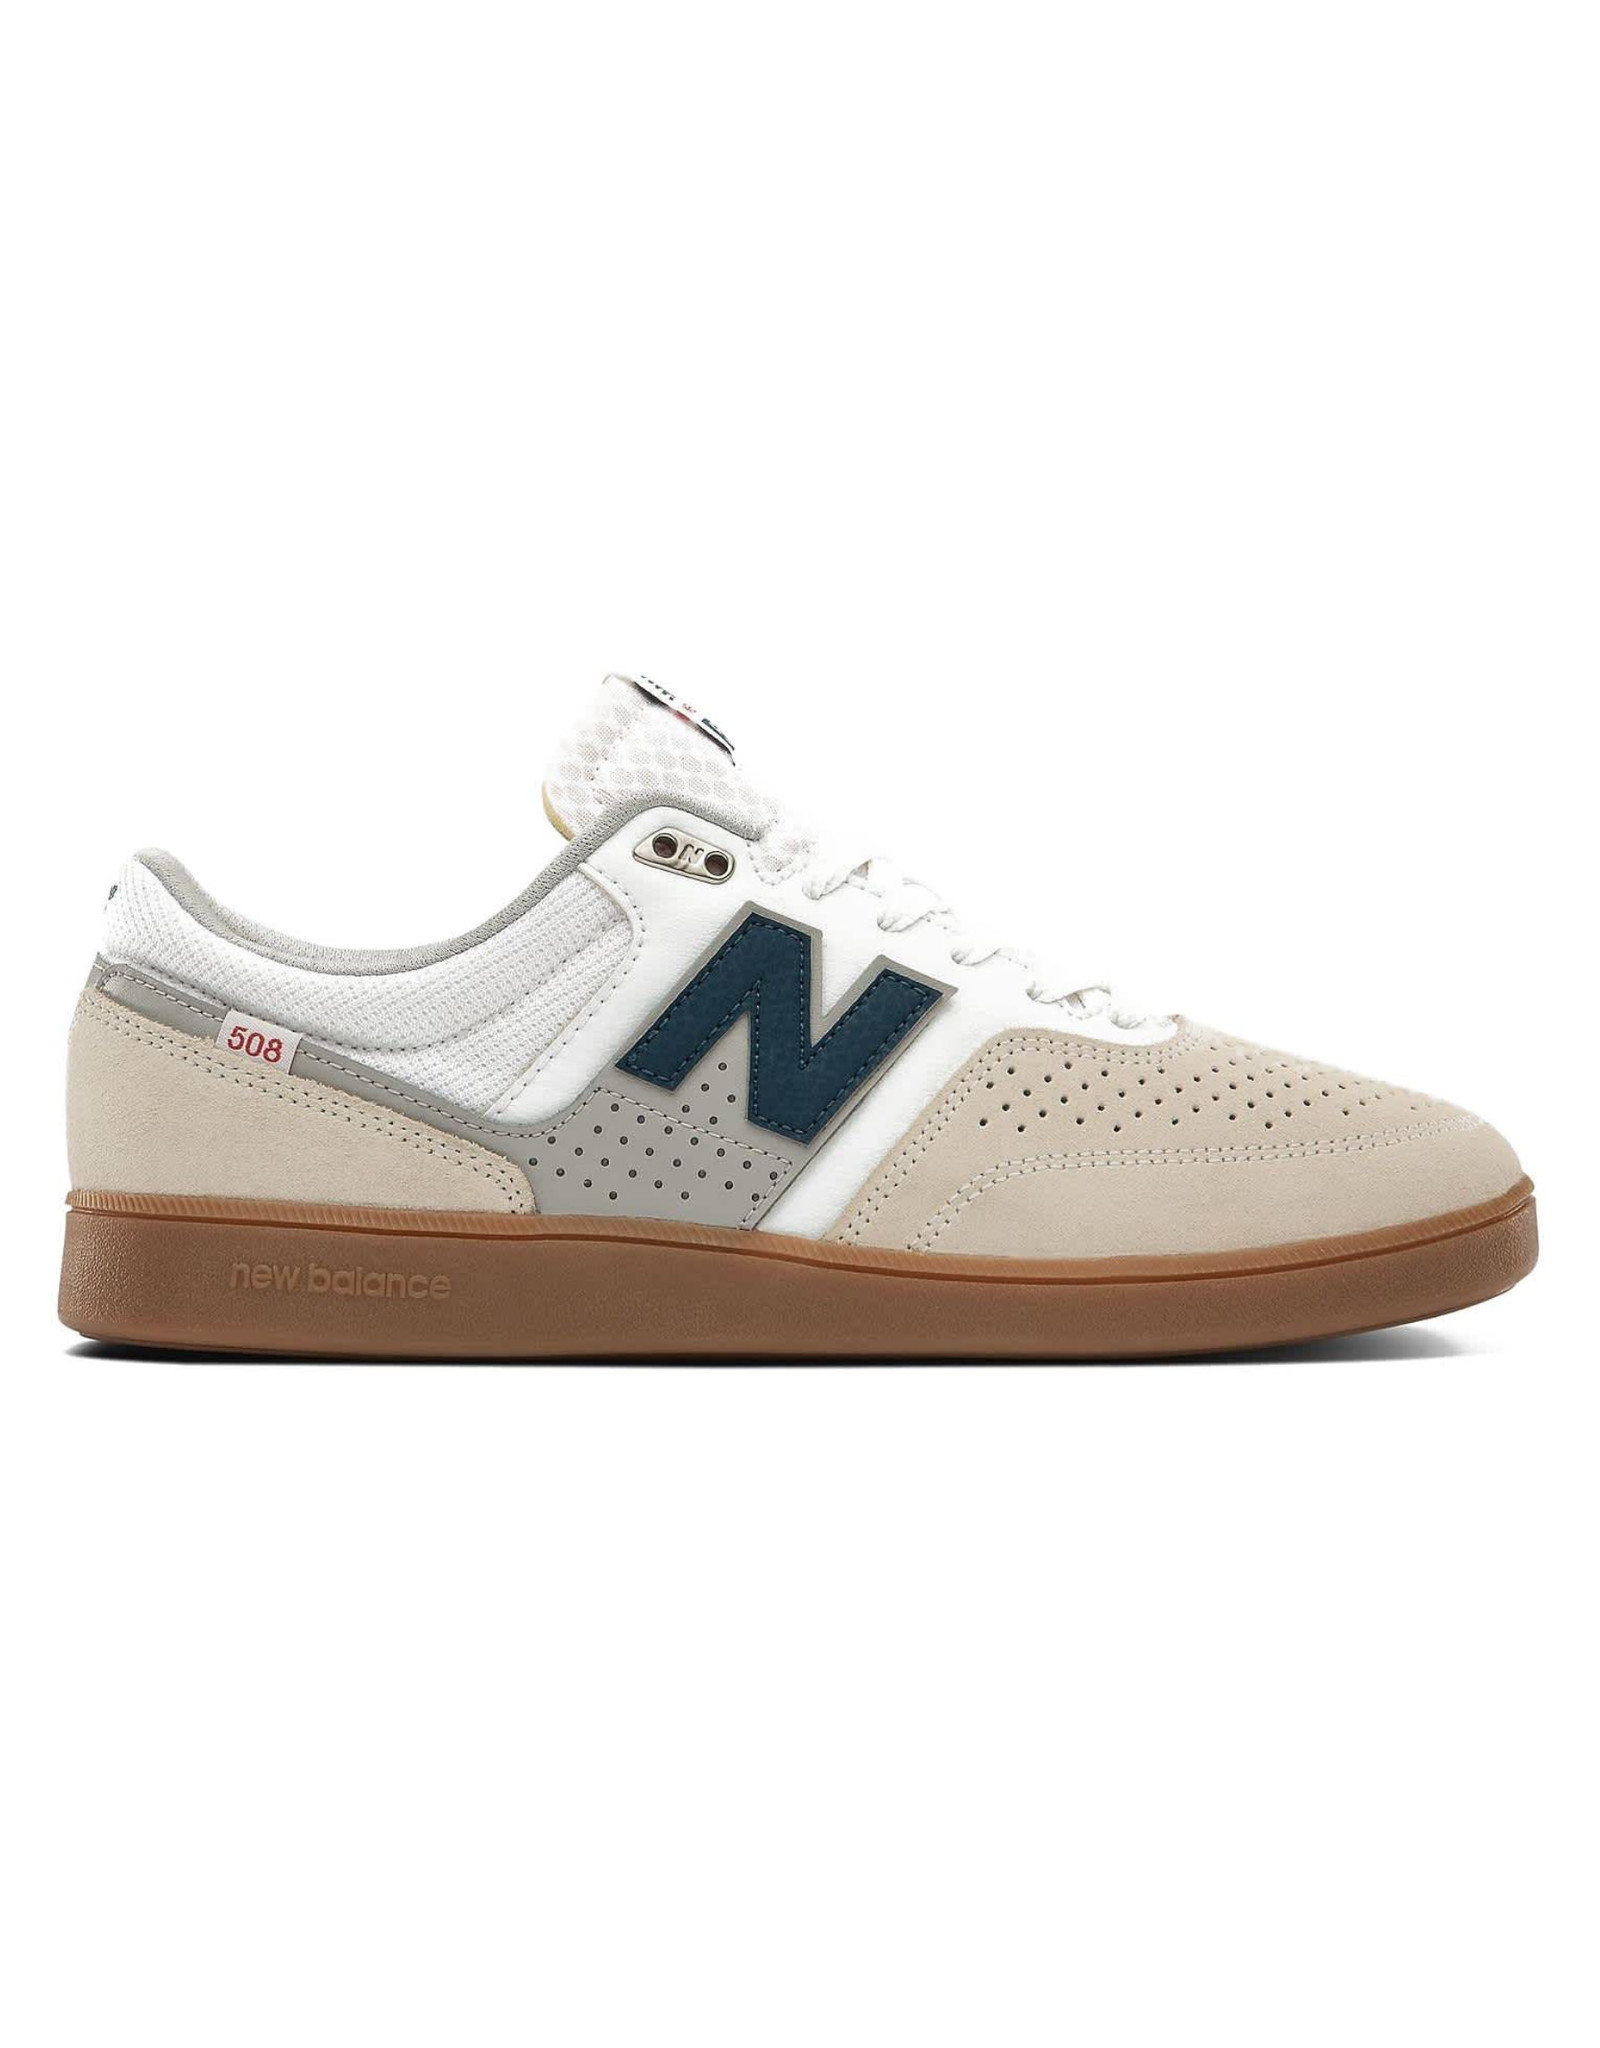 New Balance 508 Westgate